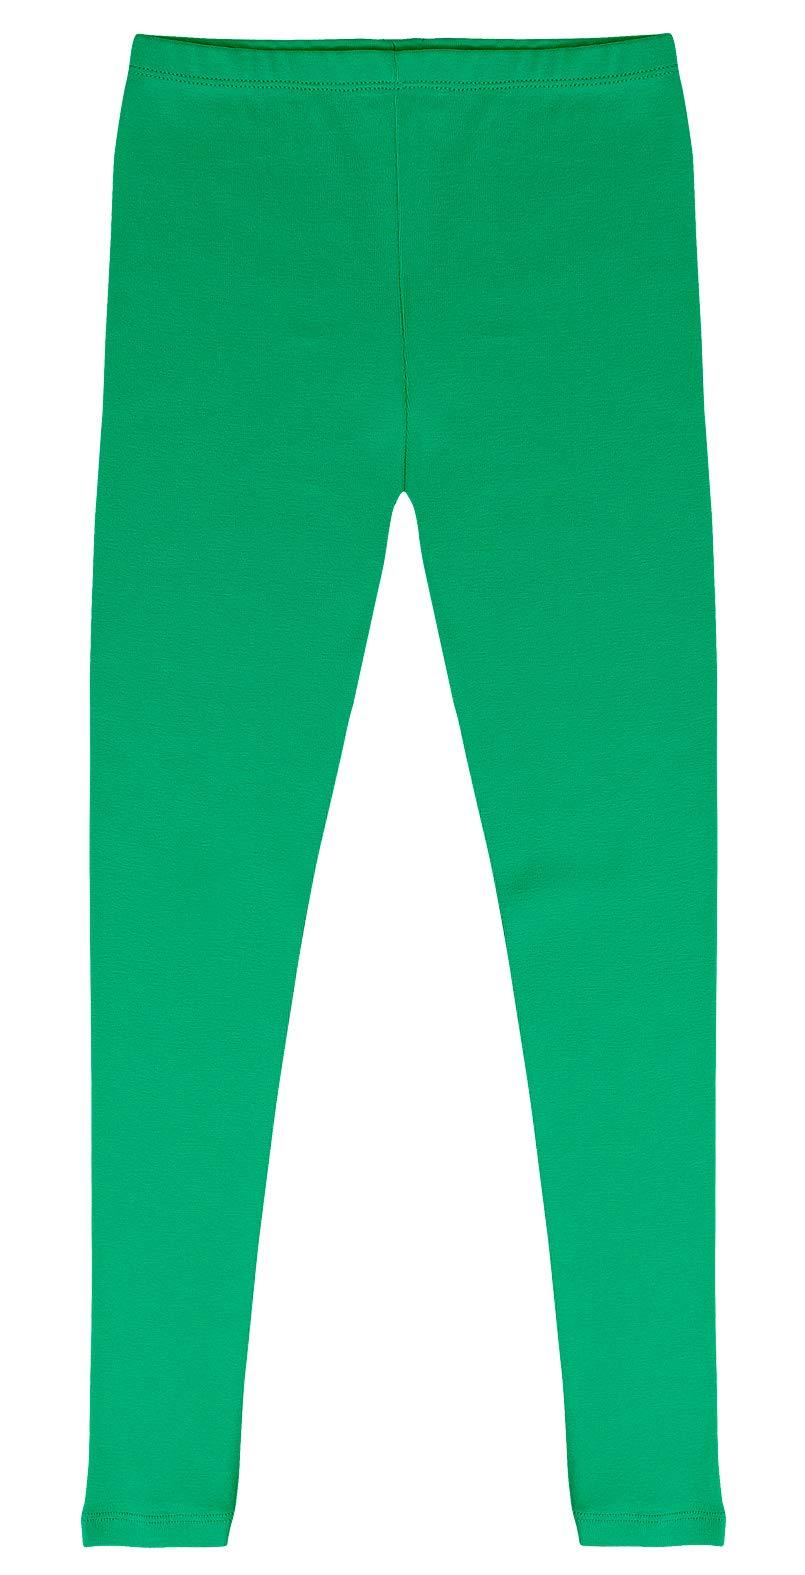 CAOMP Girls'%100 Organic Cotton Leggings for School or Play (9-10, Green)